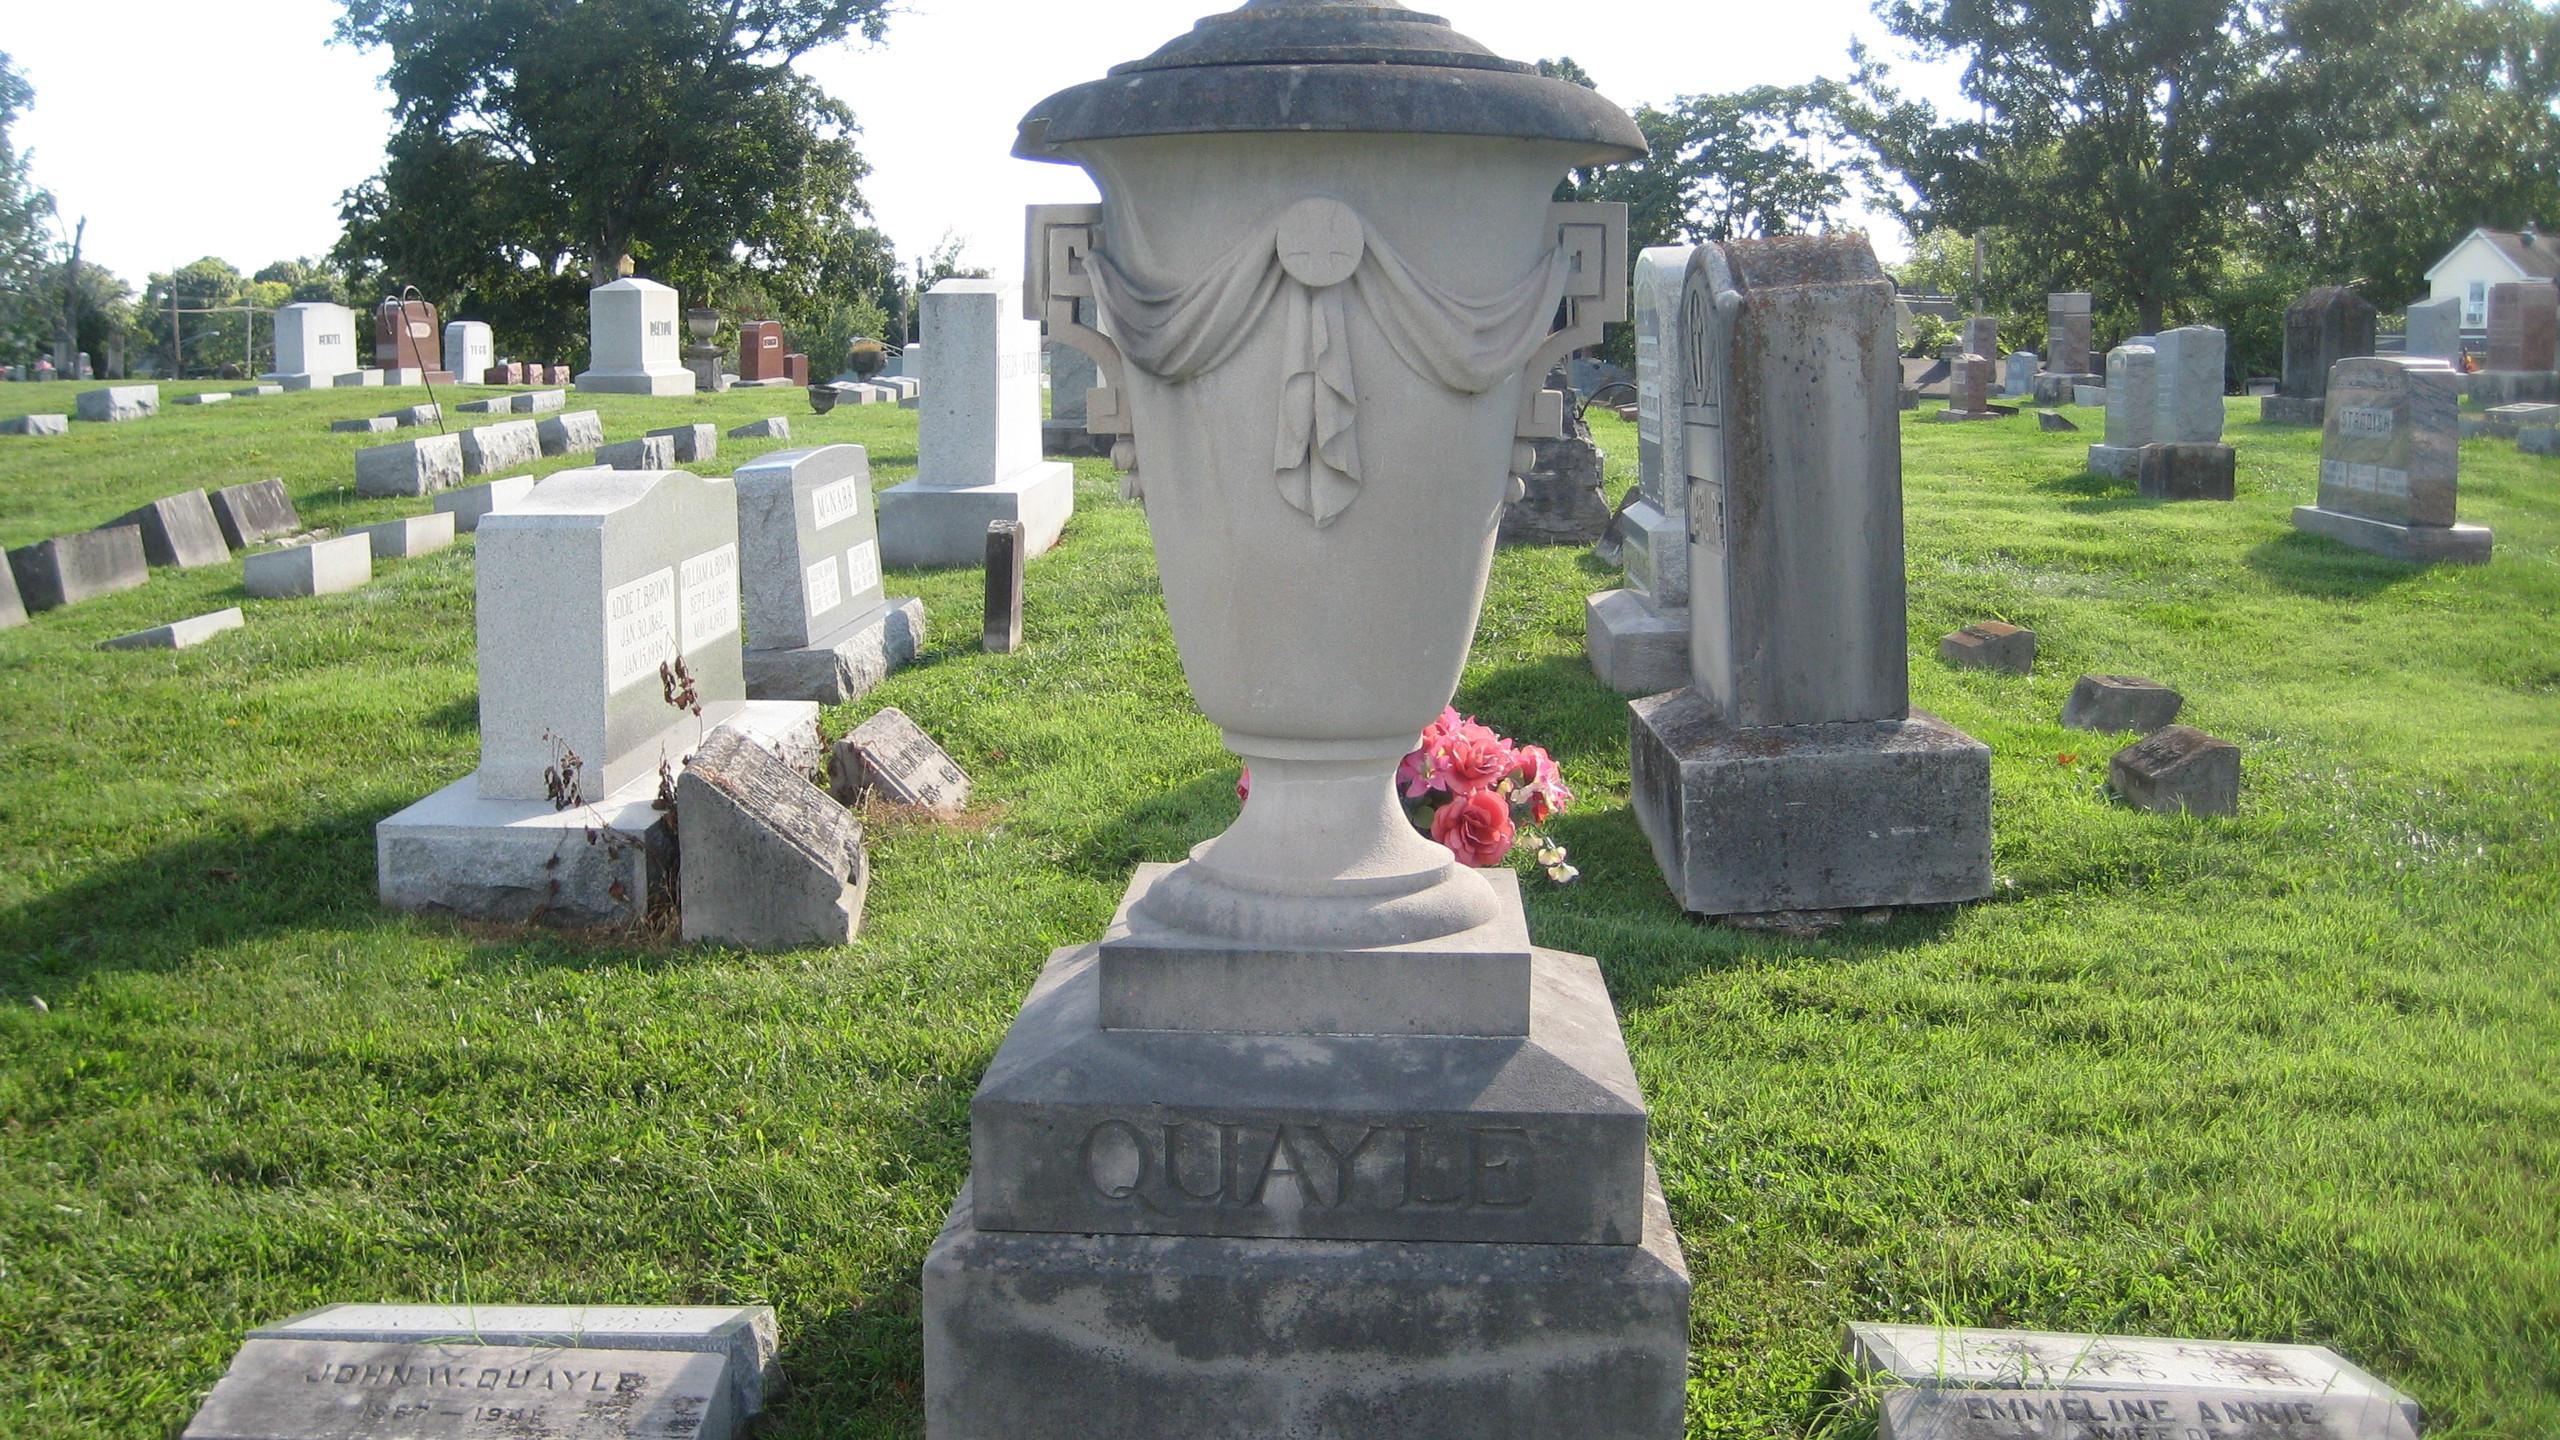 Quayle gravestones